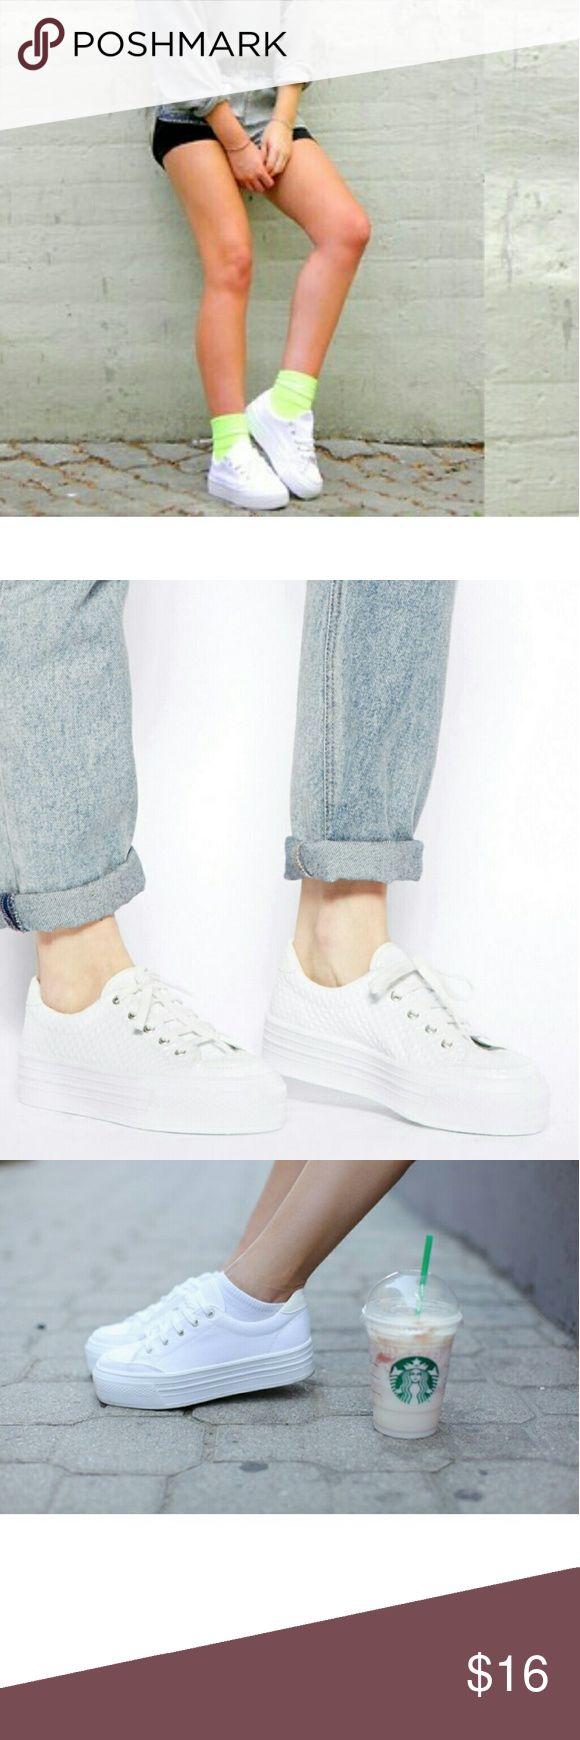 Asos dino platform white tennis brand new Asos dino platform tennis shoes uk 4 us 6 brand new! Shoes Sneakers